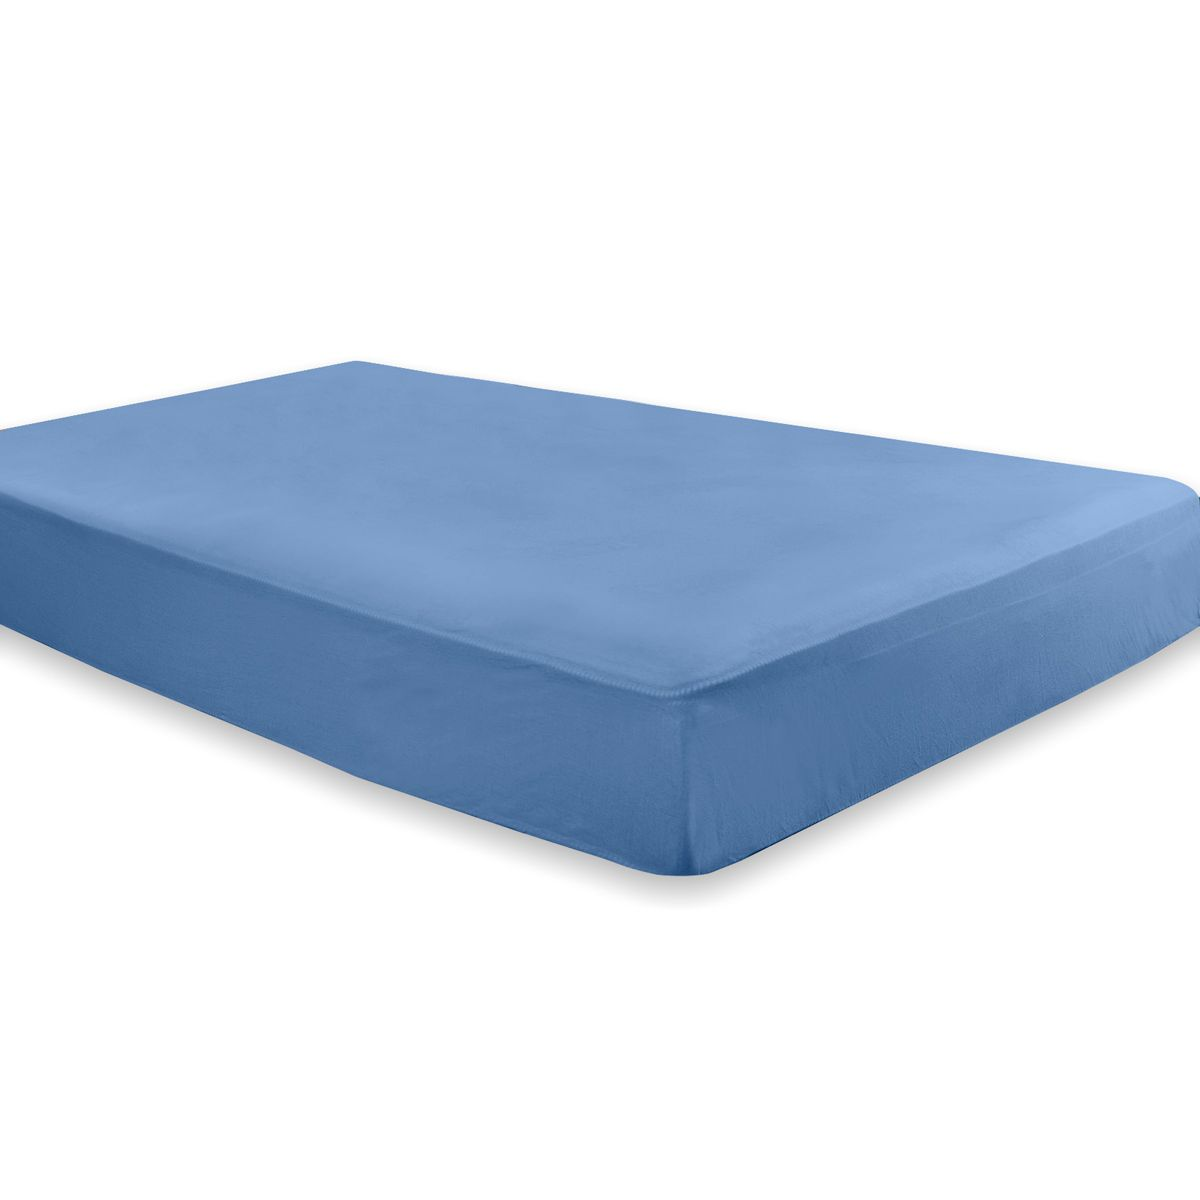 Lençol Avulso Azul Liso Queen - Malha 100% Algodão